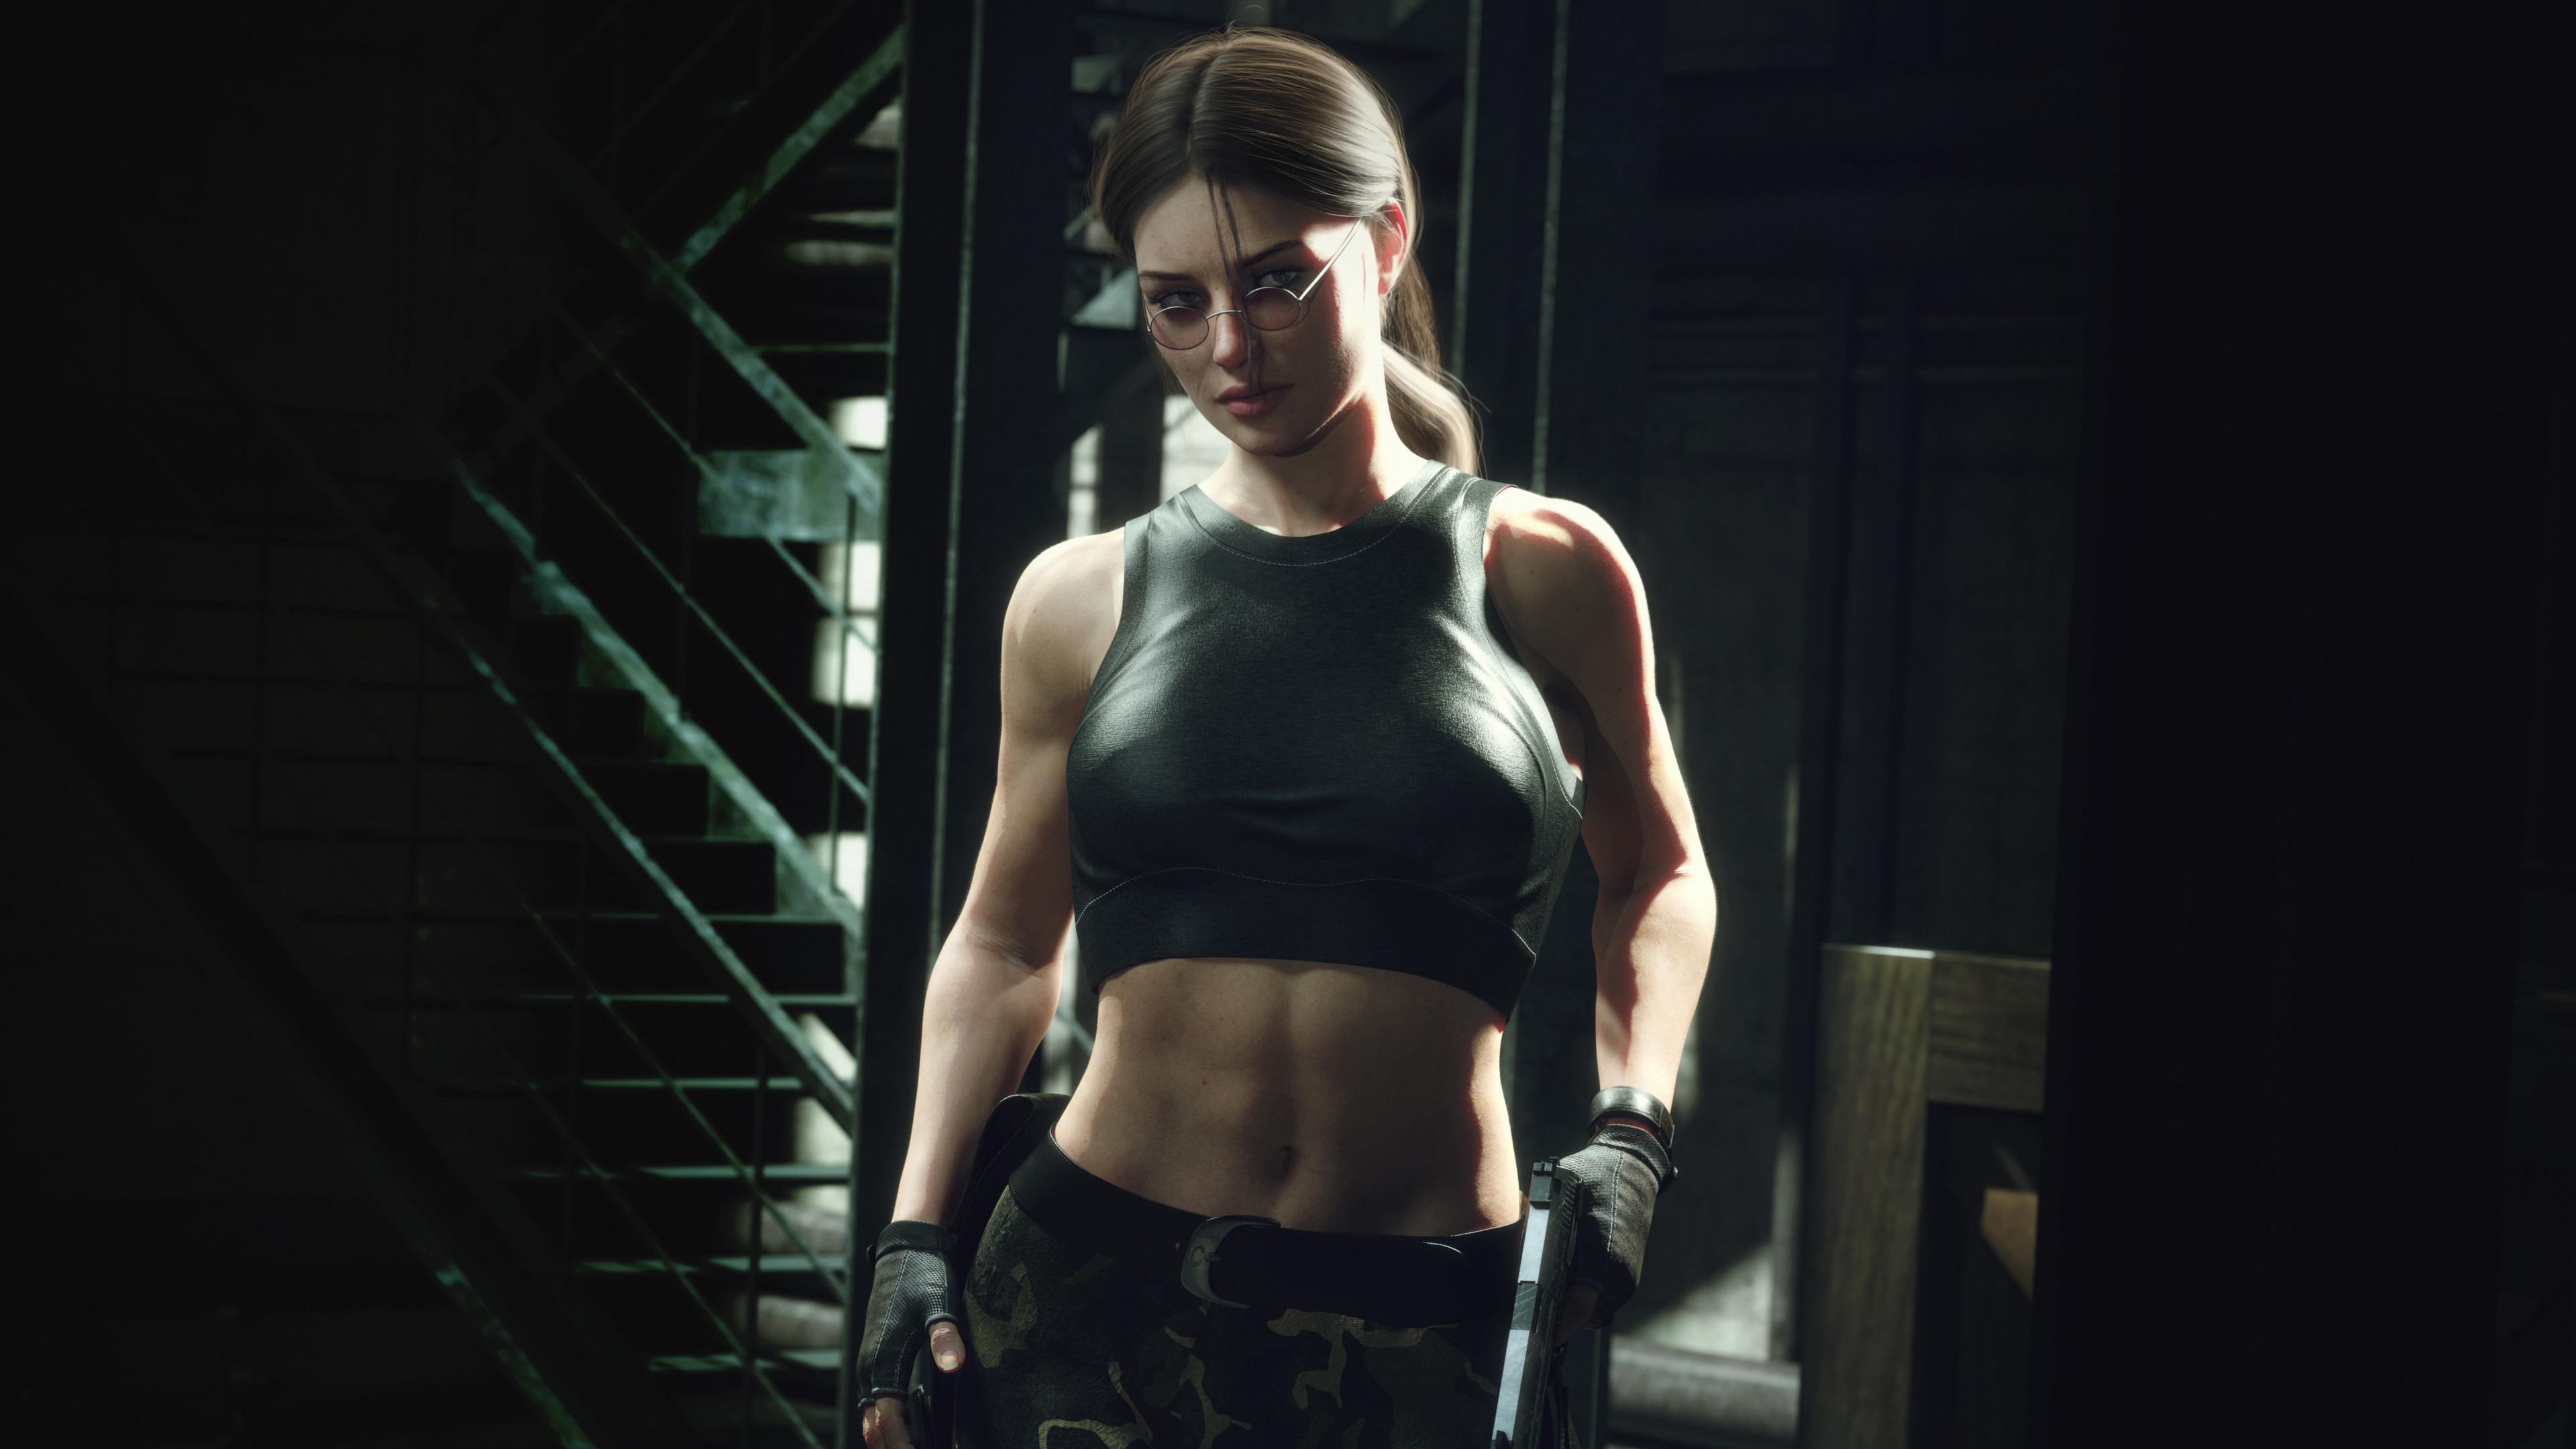 General 3840x2160 Tomb Raider Lara Croft video games women glasses boobs big boobs muscular ponytail gun weapon blurry background eyeshadow eyelashes eyeliner 3D stairs sporty